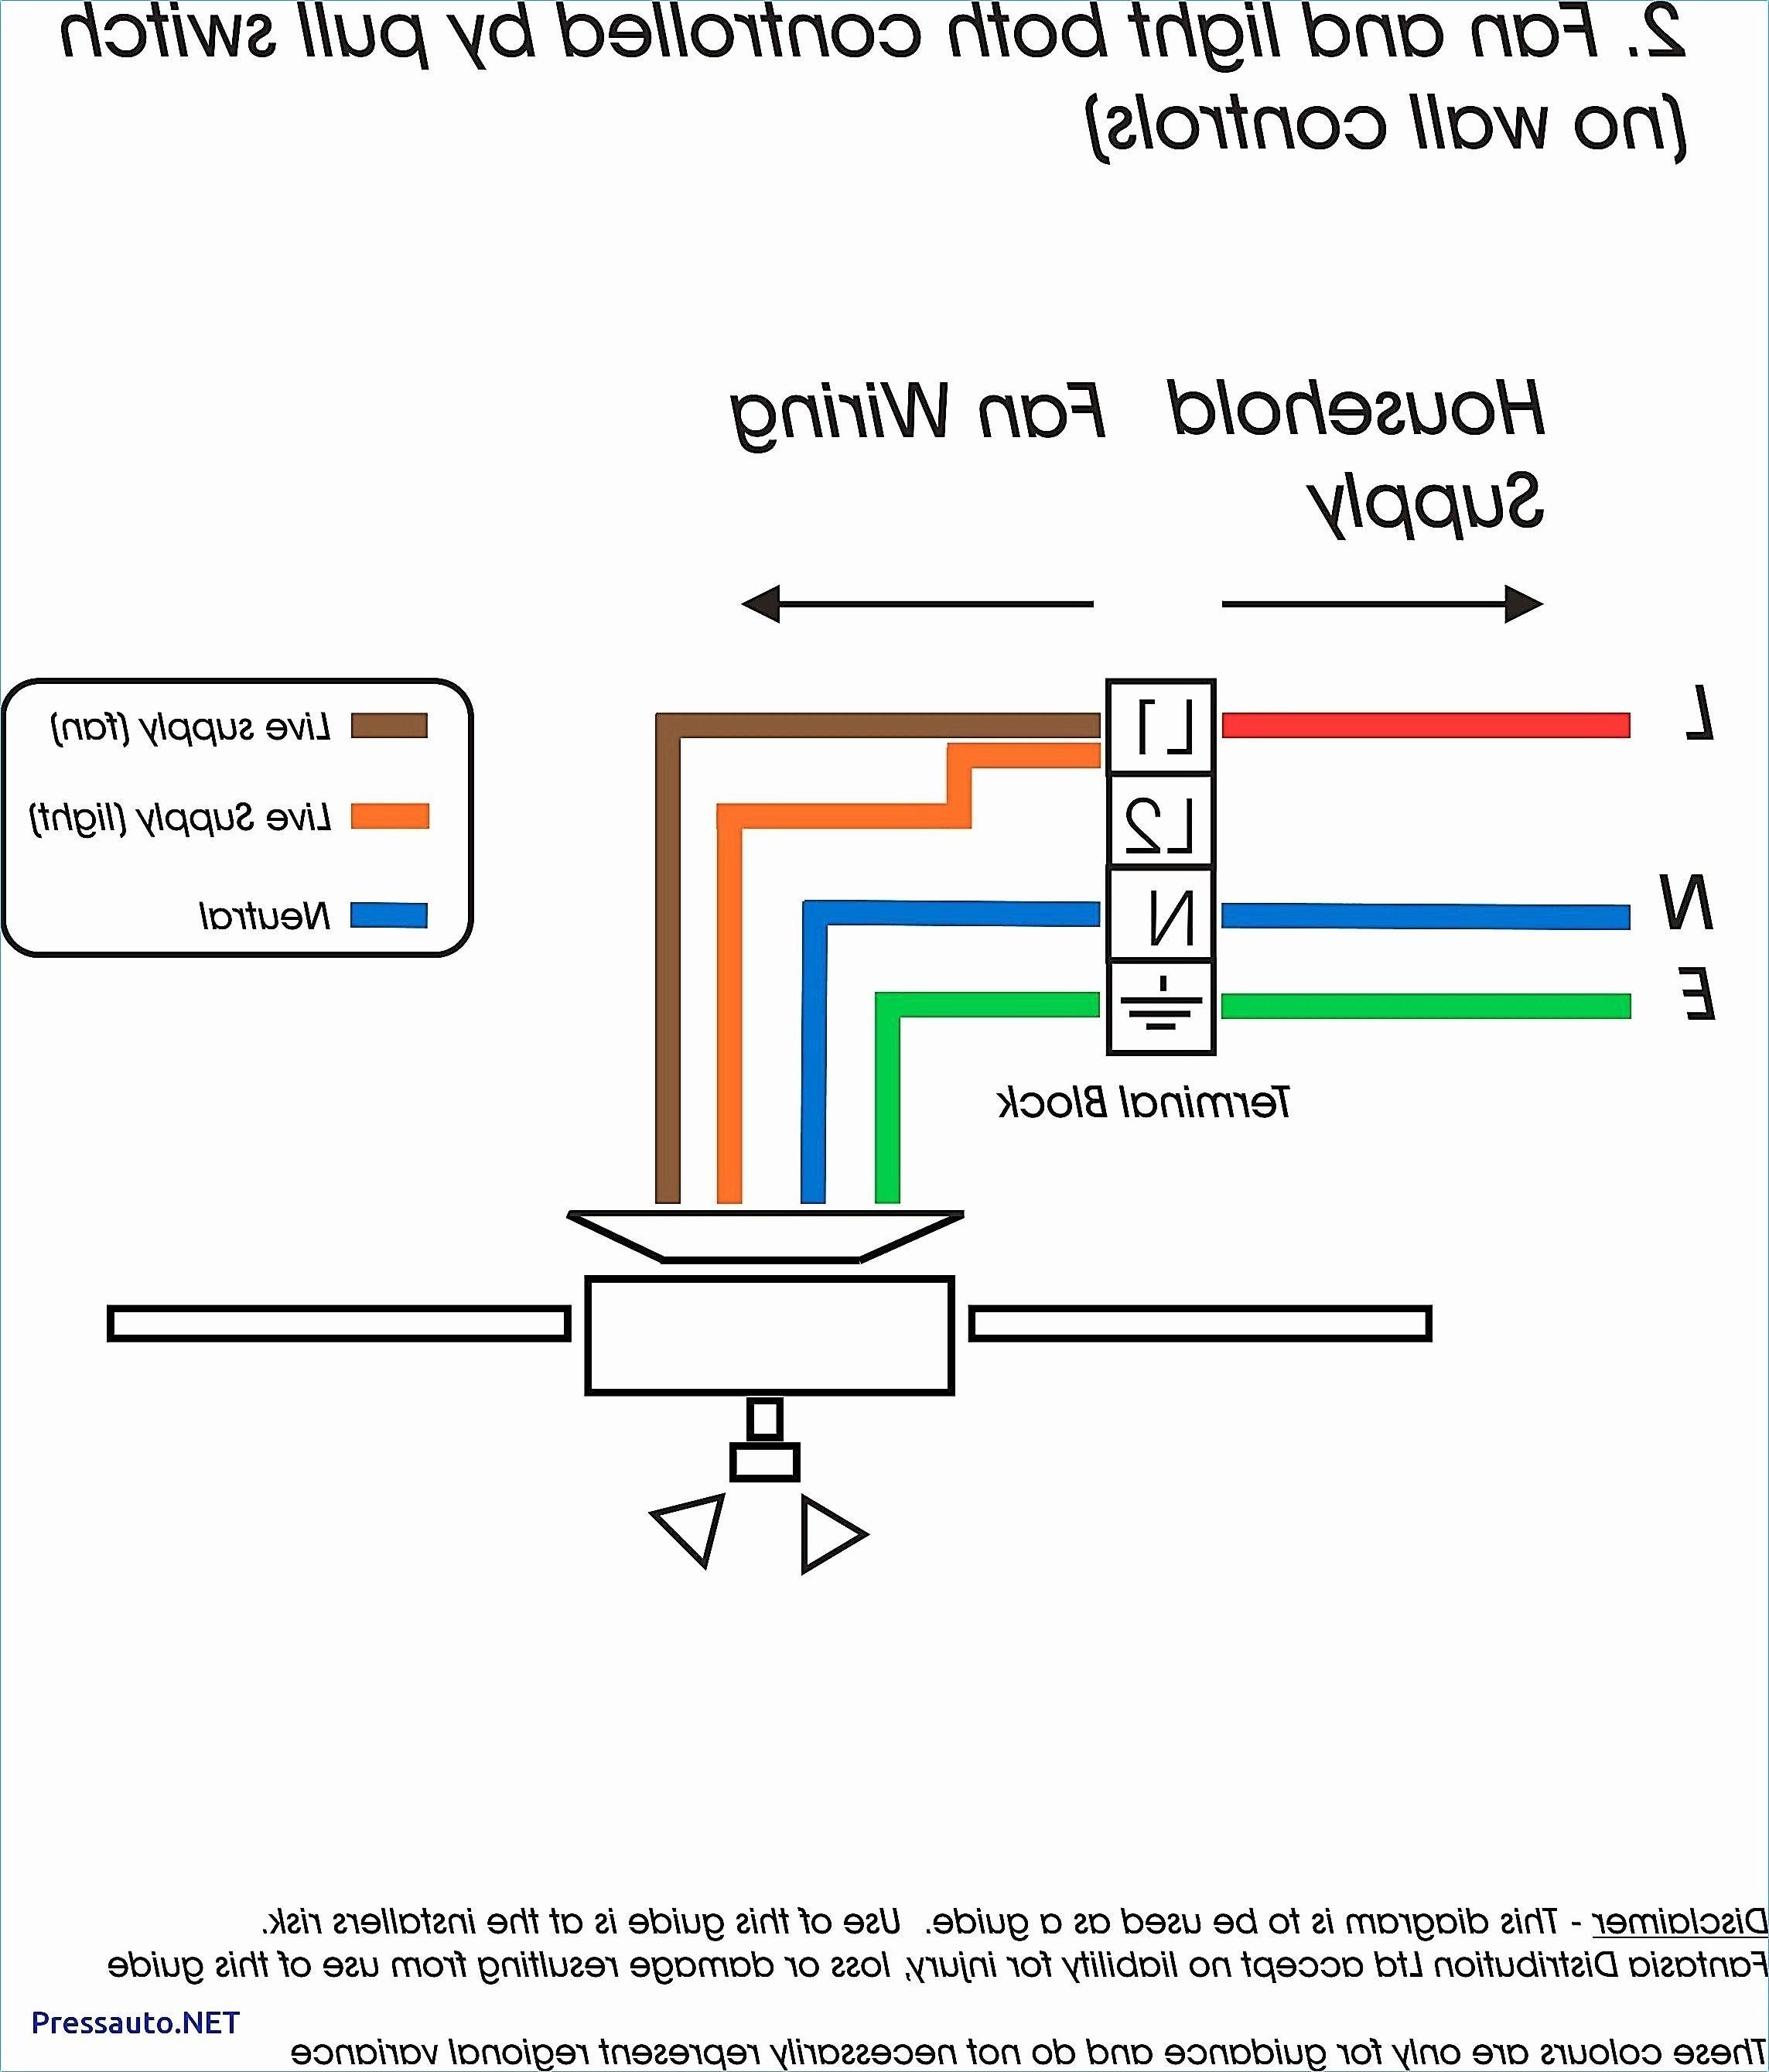 Garage Door Wiring Diagram Wiring Diagram Garage Door New Electrical Wiring Diagram for Garage Of Garage Door Wiring Diagram